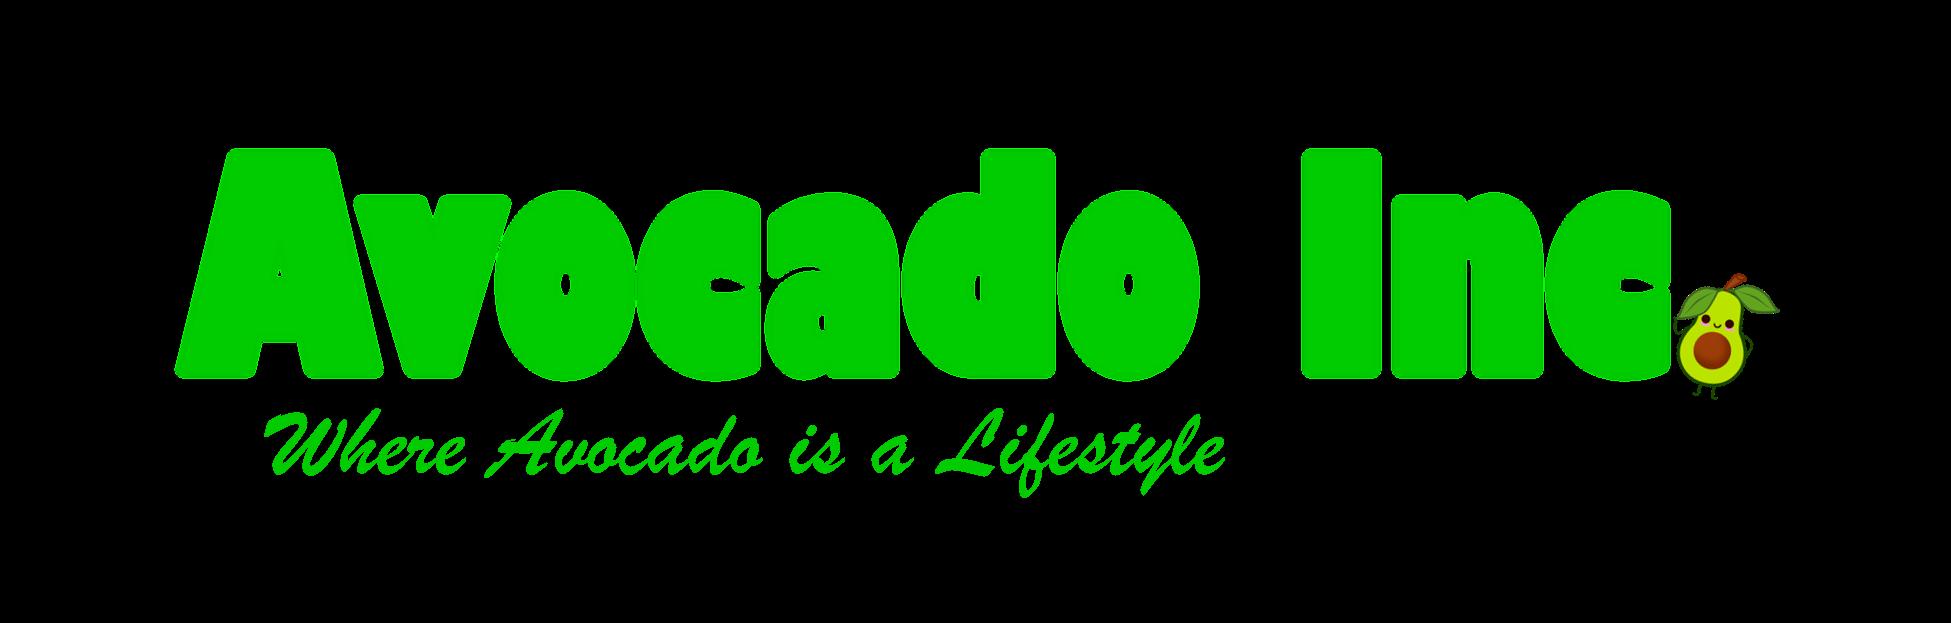 avacado-ing-icon